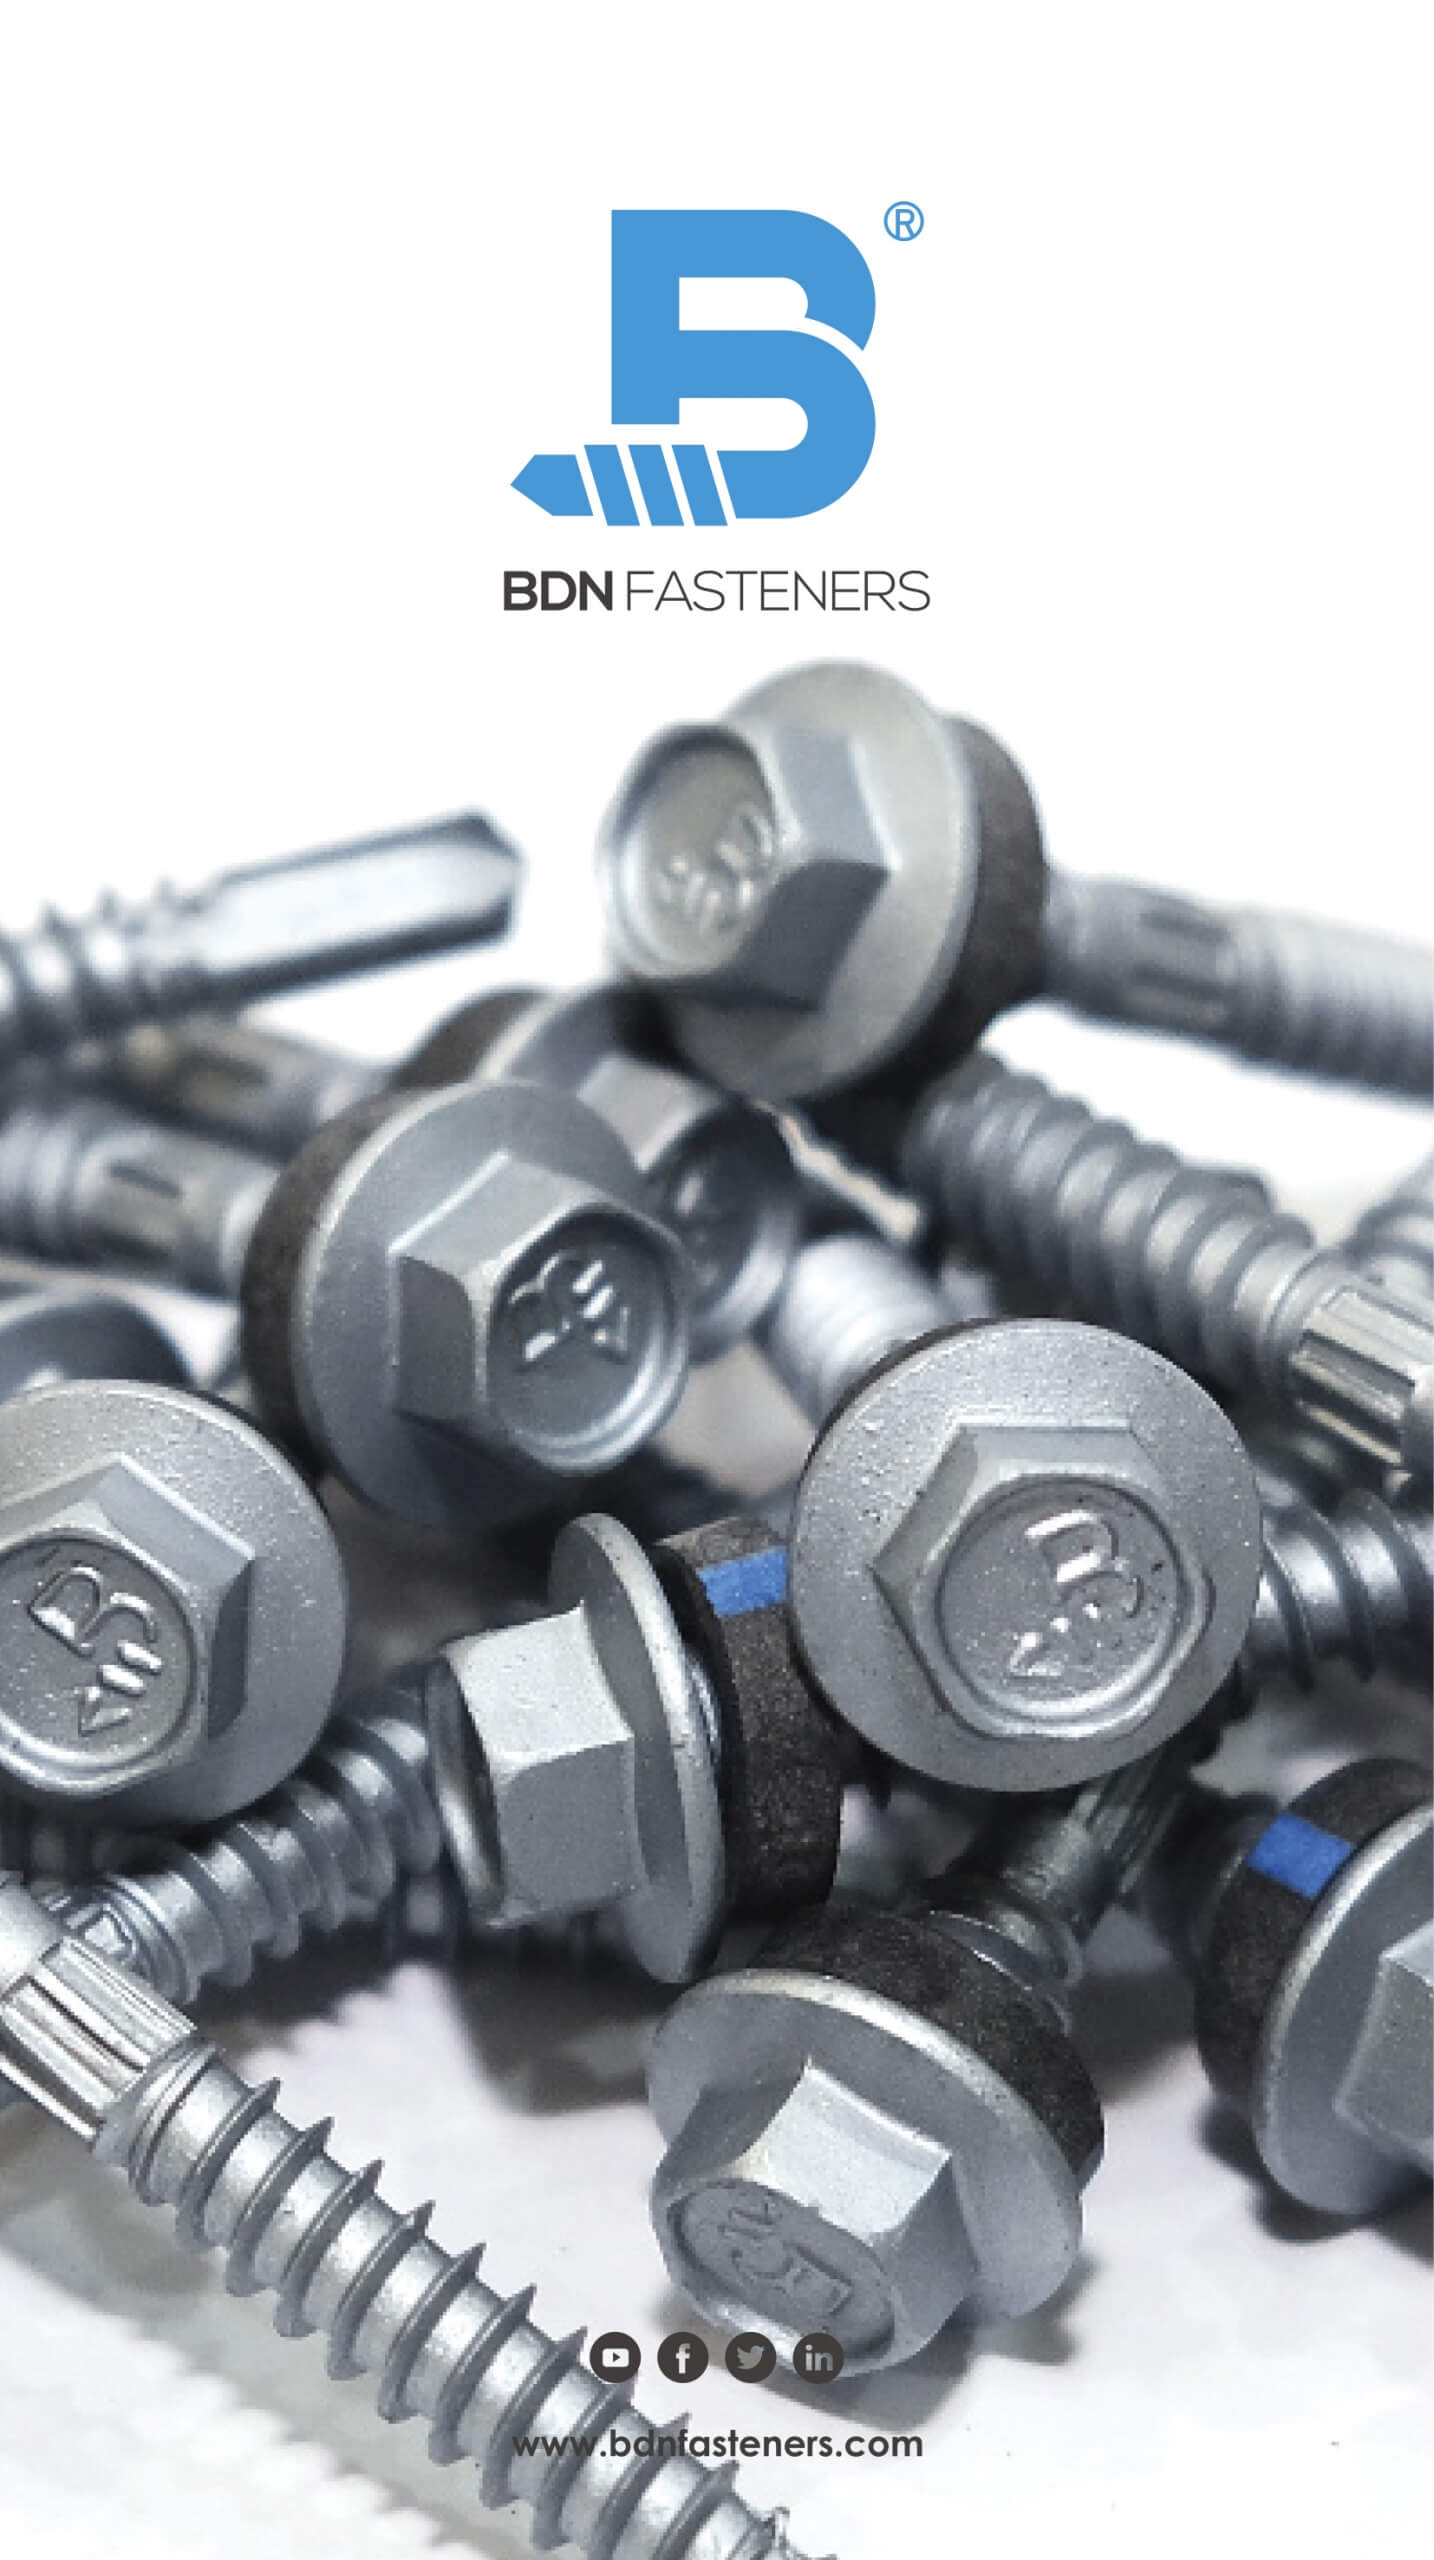 BDN FASTENERS® METAL-Tite™ Class 2 Product Brochure 2020